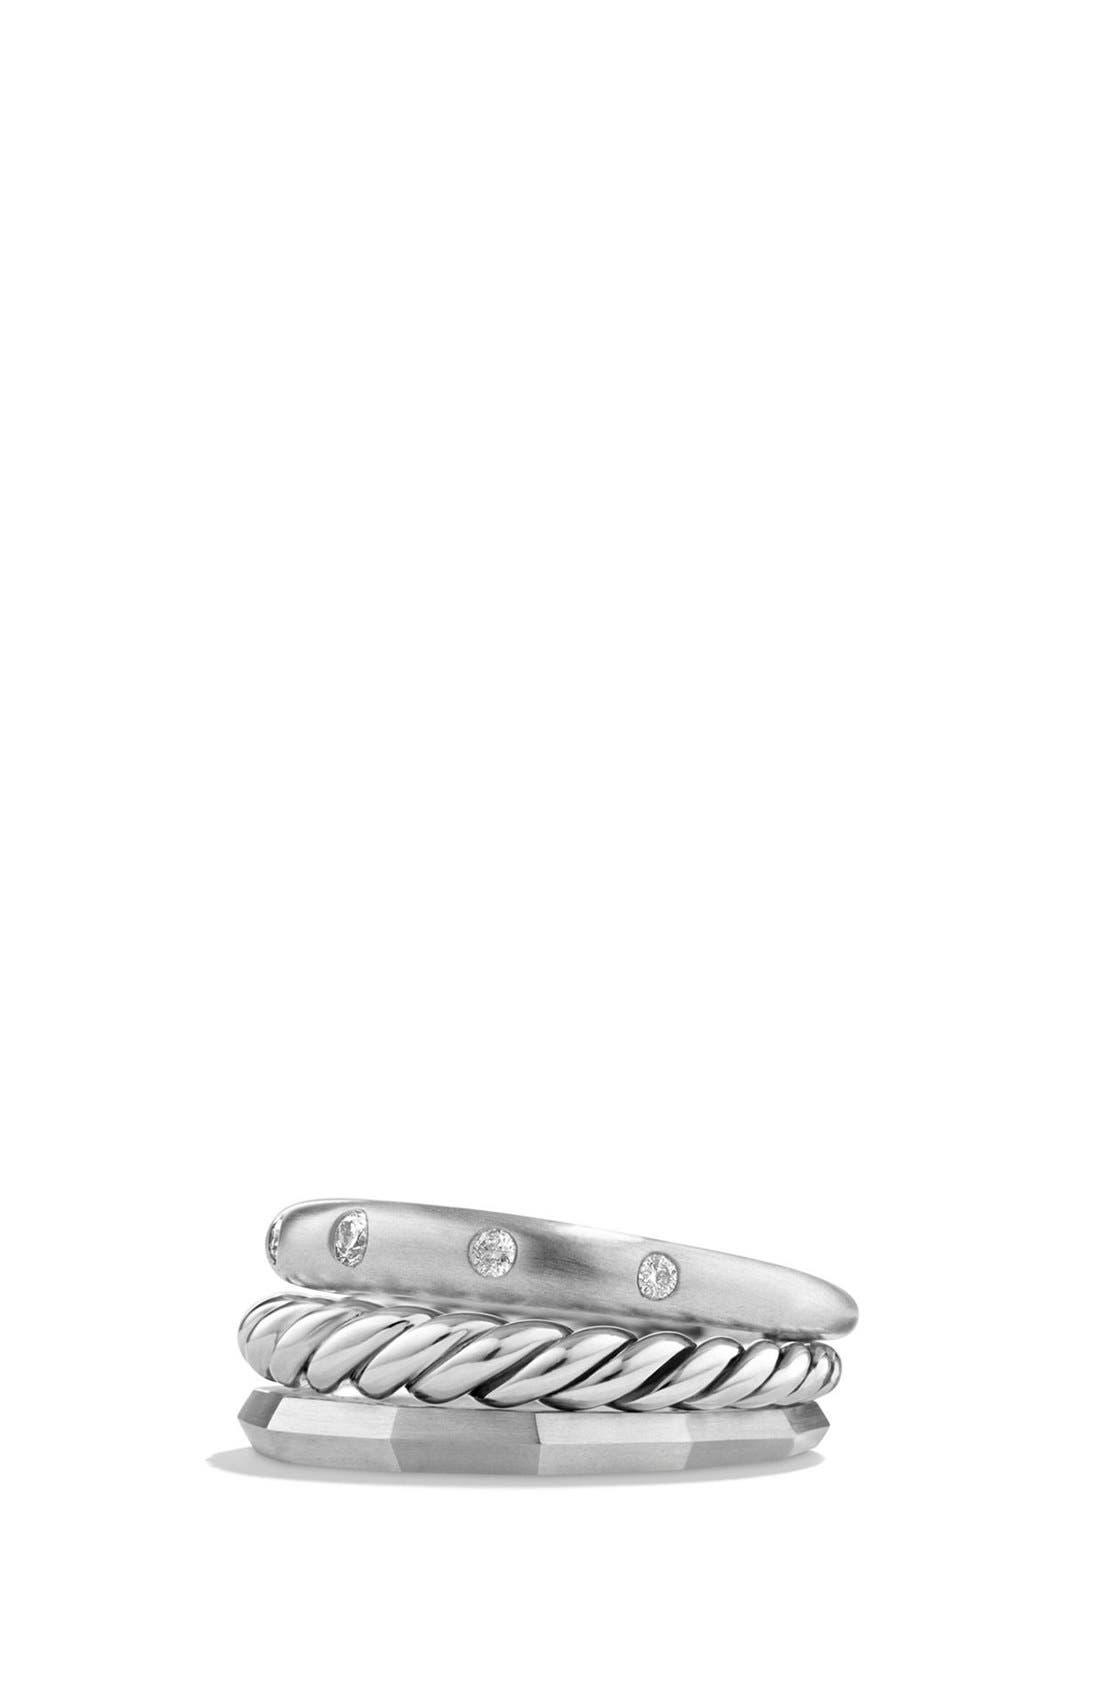 David Yurman 'Stax' Ring with Diamonds